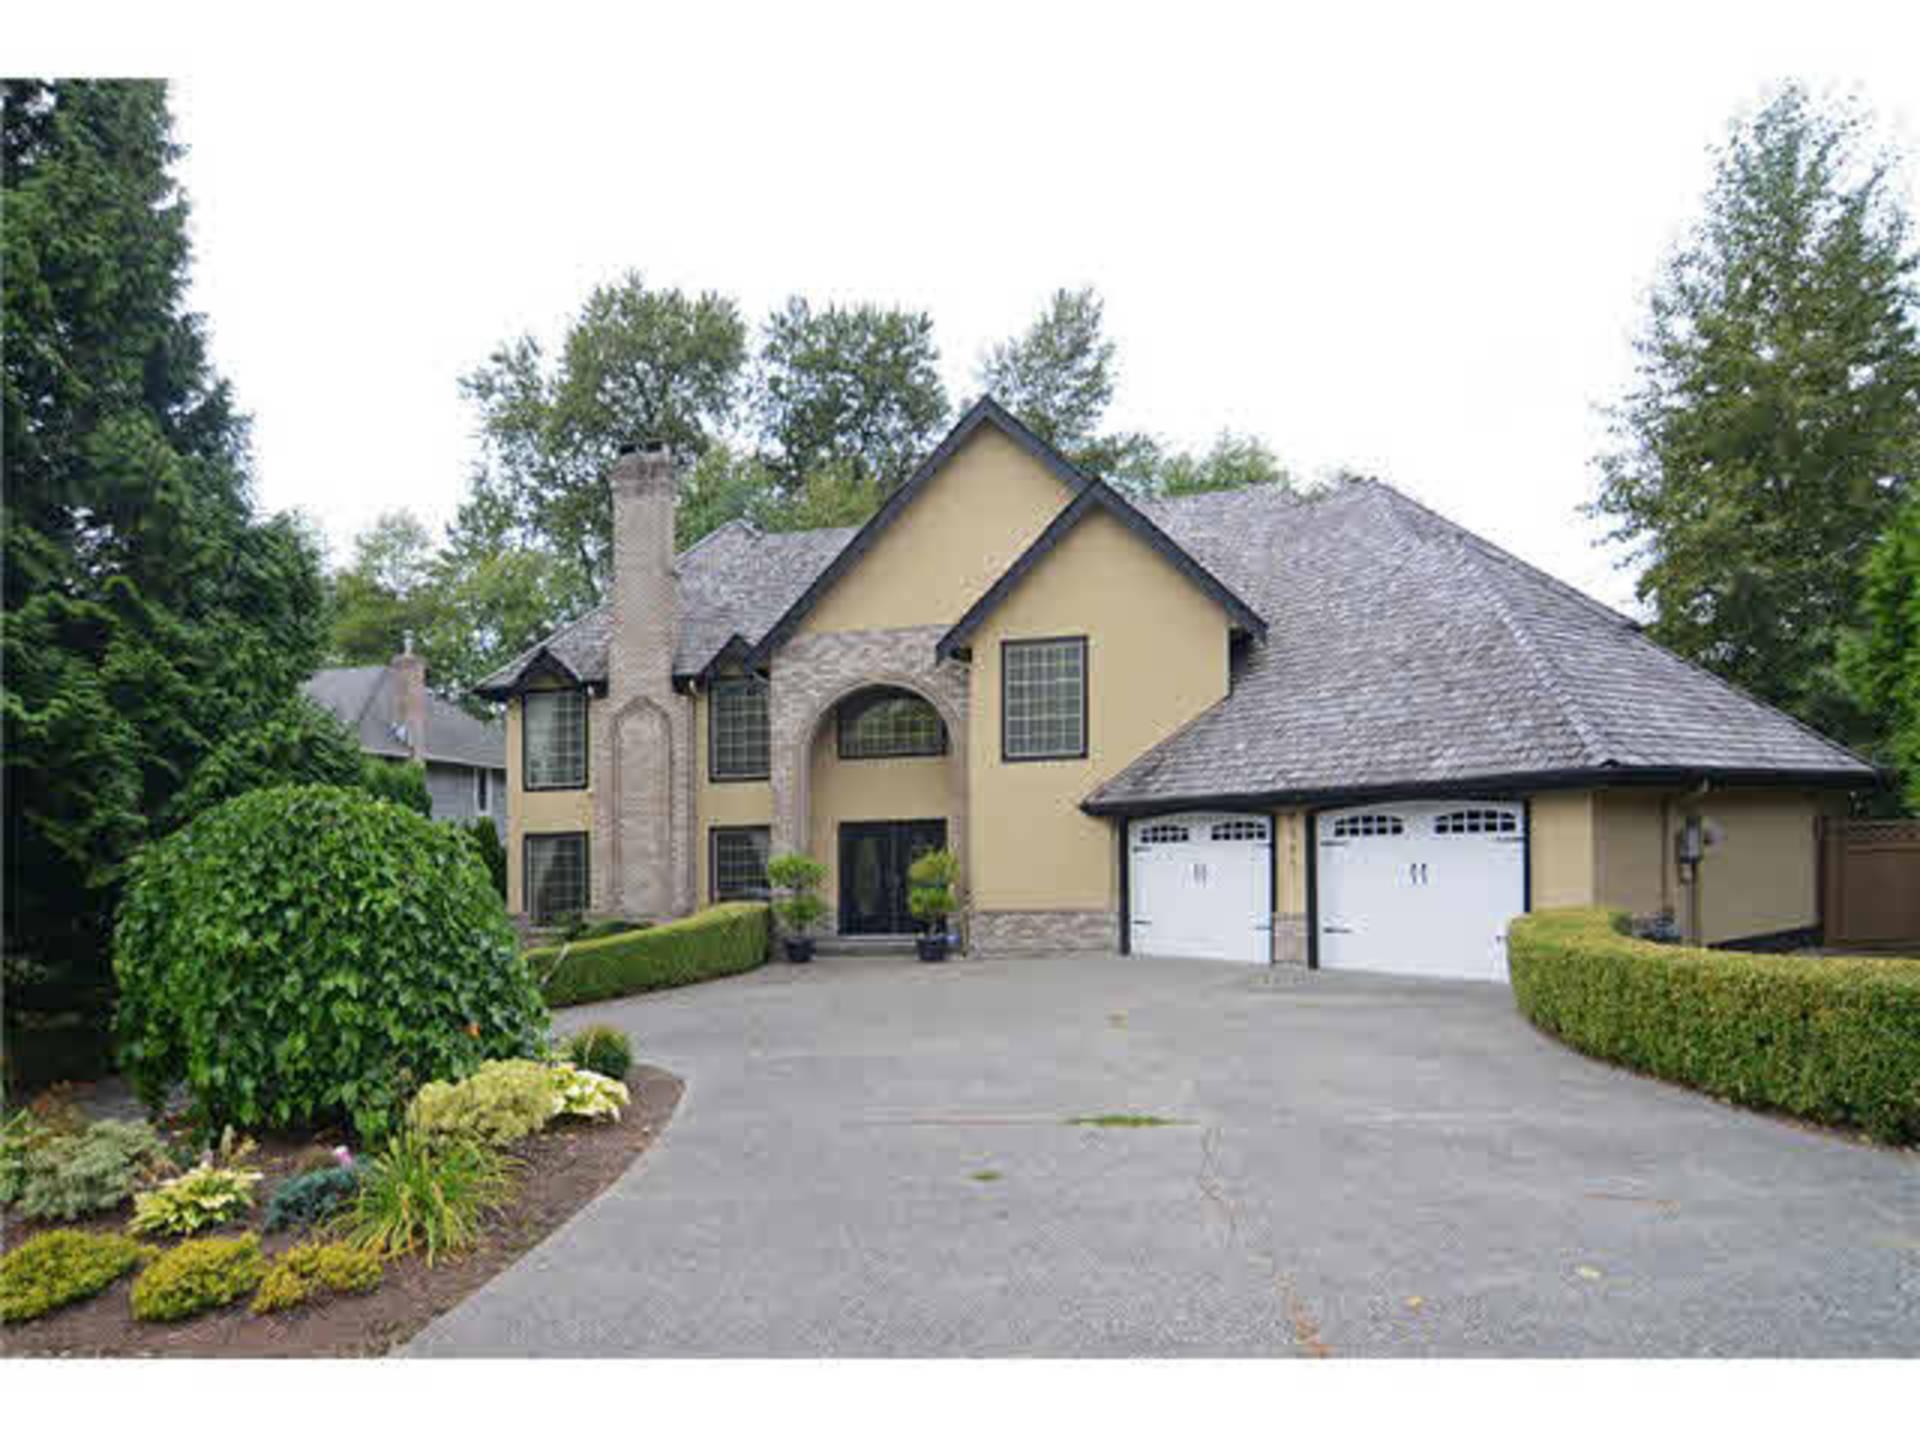 8393 148b Street, Bear Creek Green Timbers, Surrey photo number 1